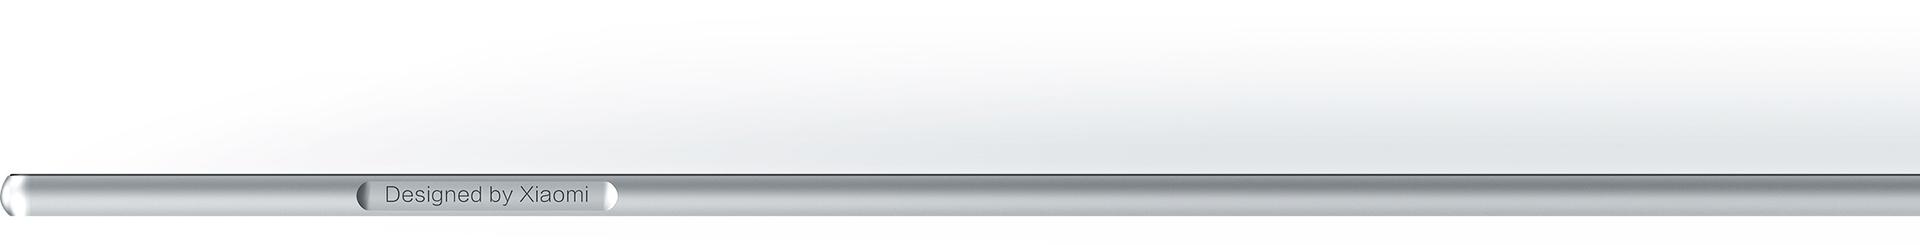 Xiaomi design